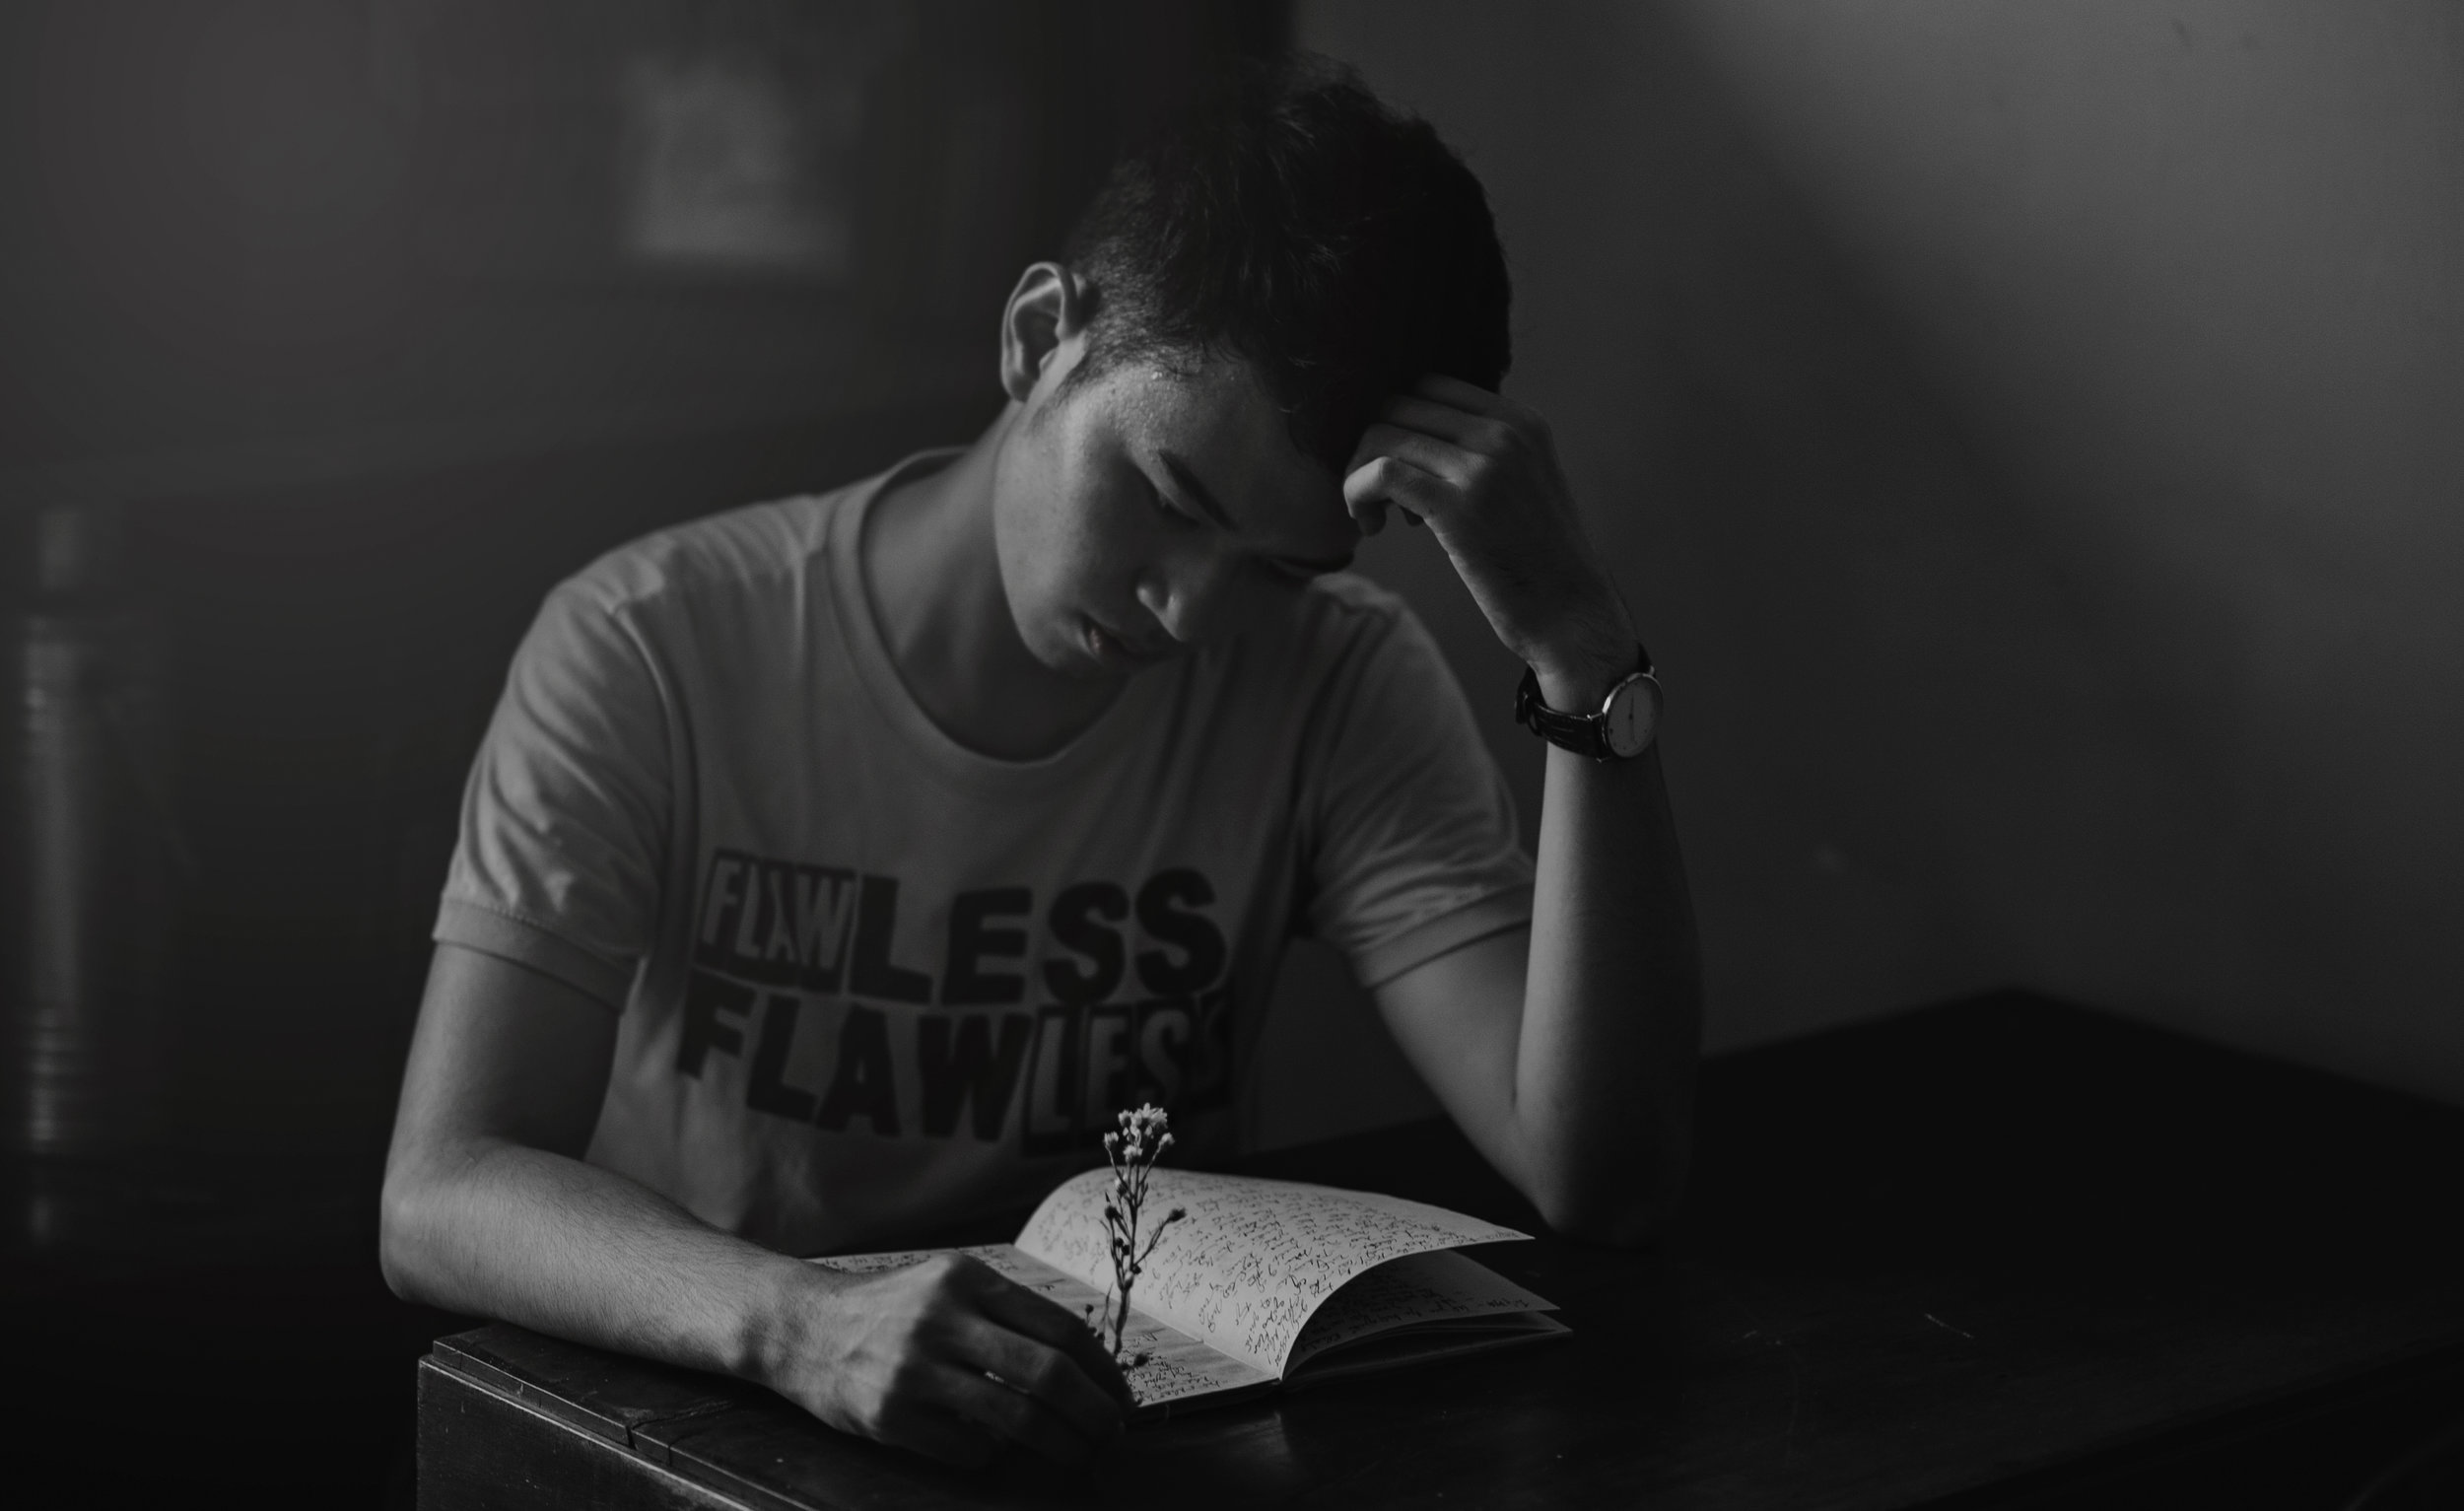 anxiety specialist teen therapist hoboken nj